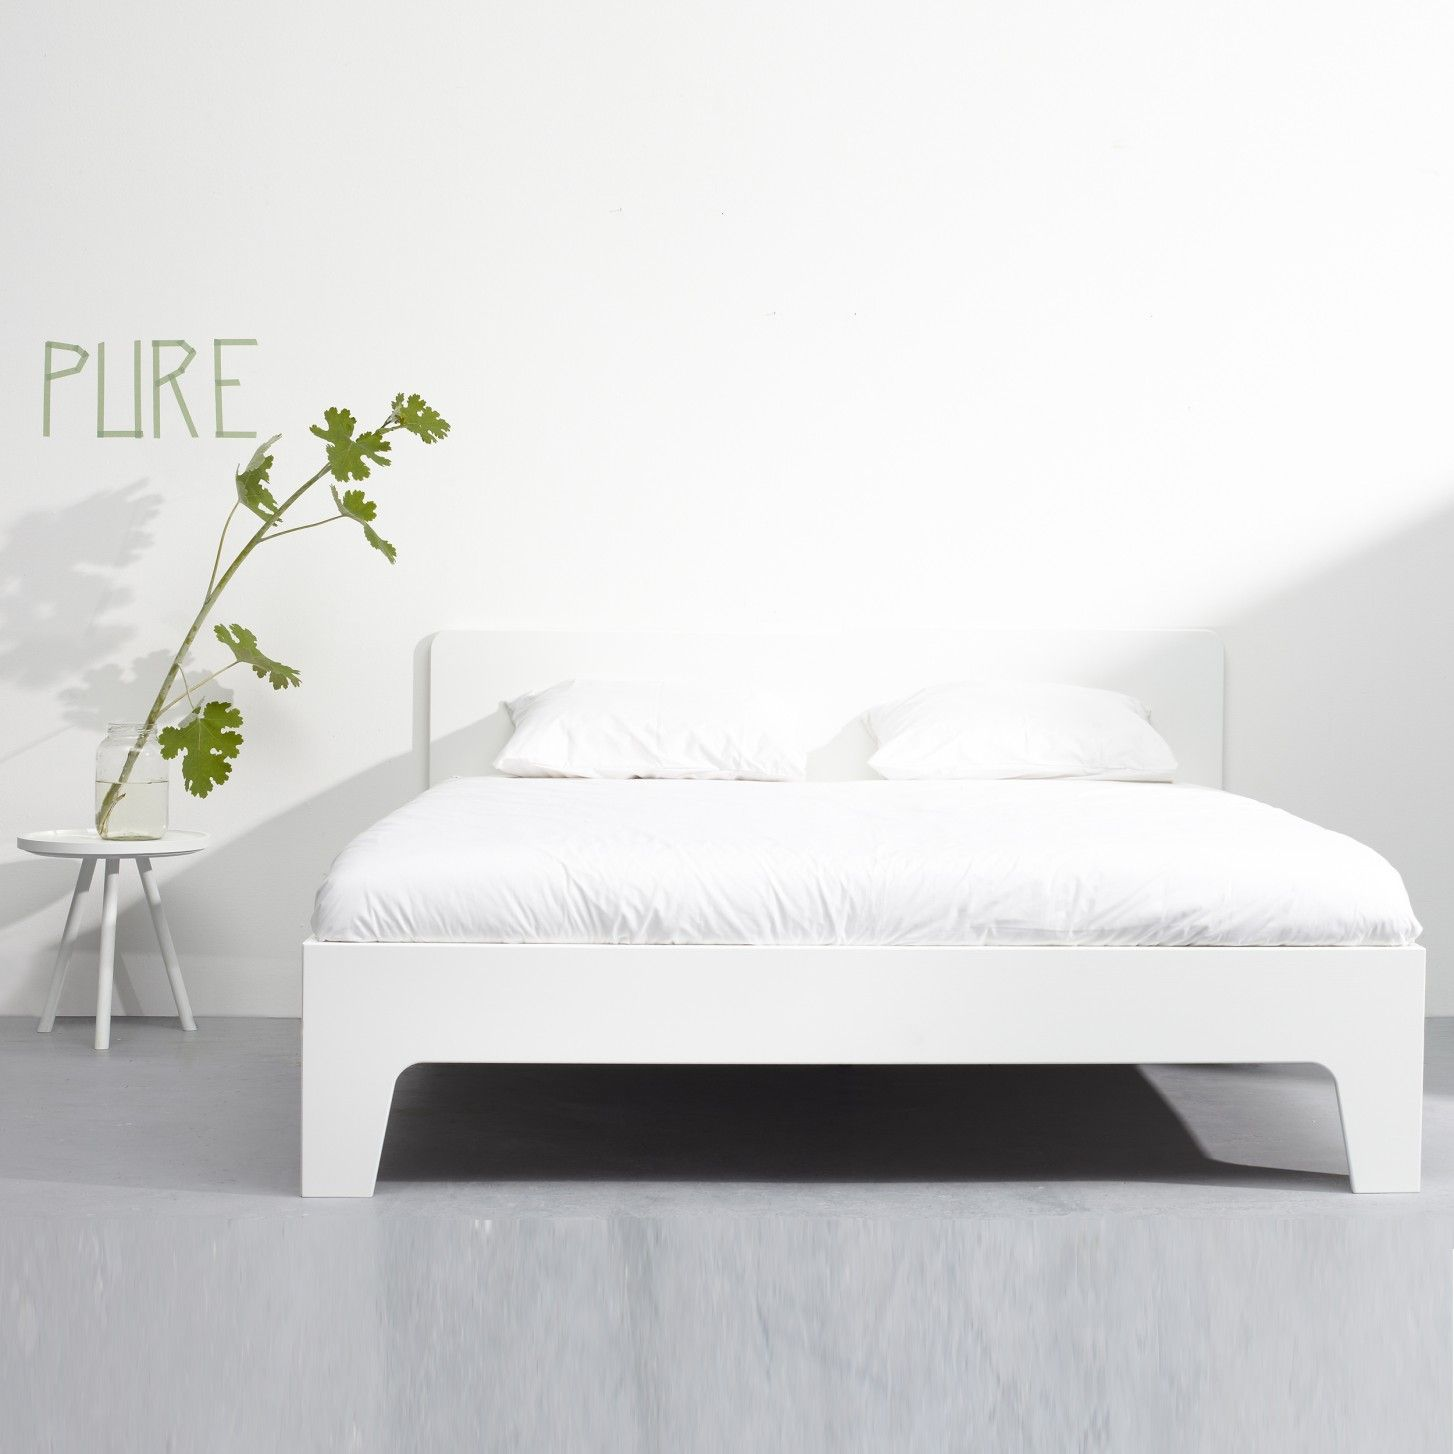 Pure Bett Von Trecompany Bei Ikarus Design Bett